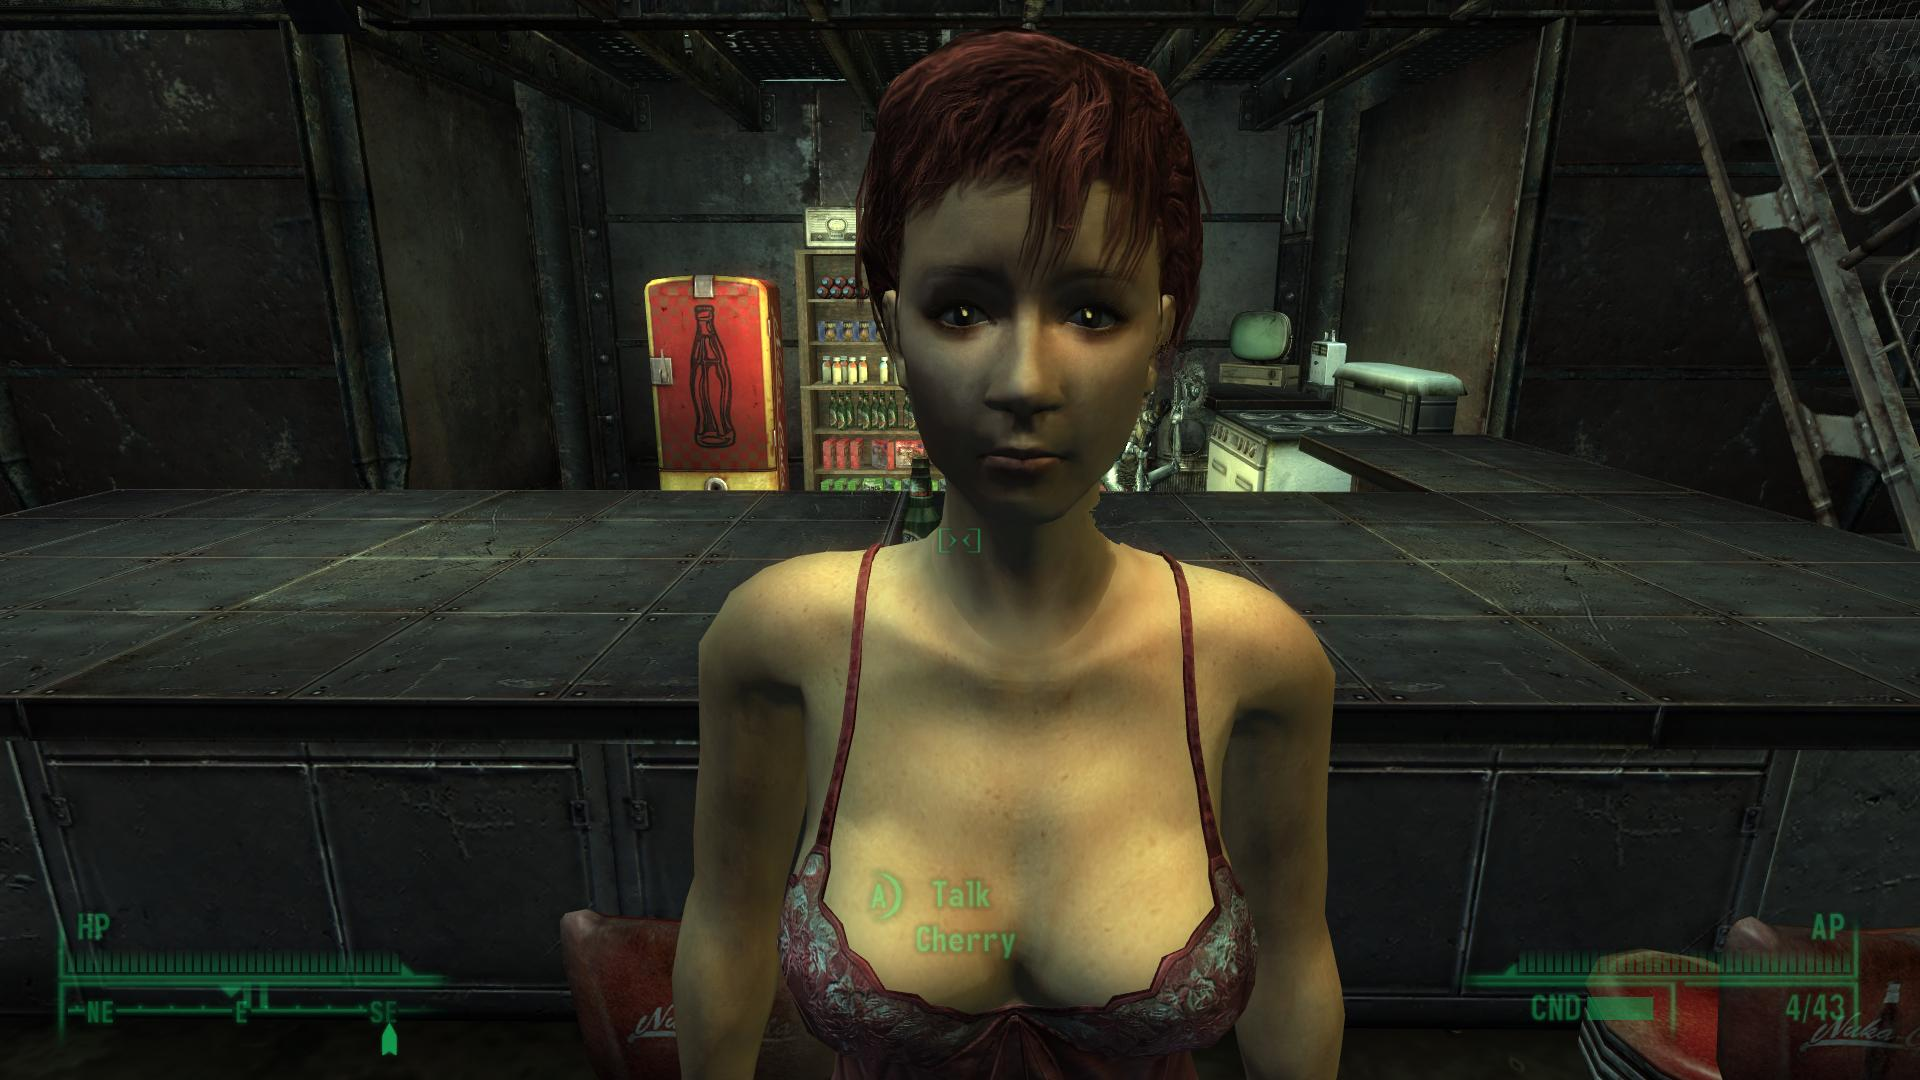 Fallout 3 секс мод для женьшин